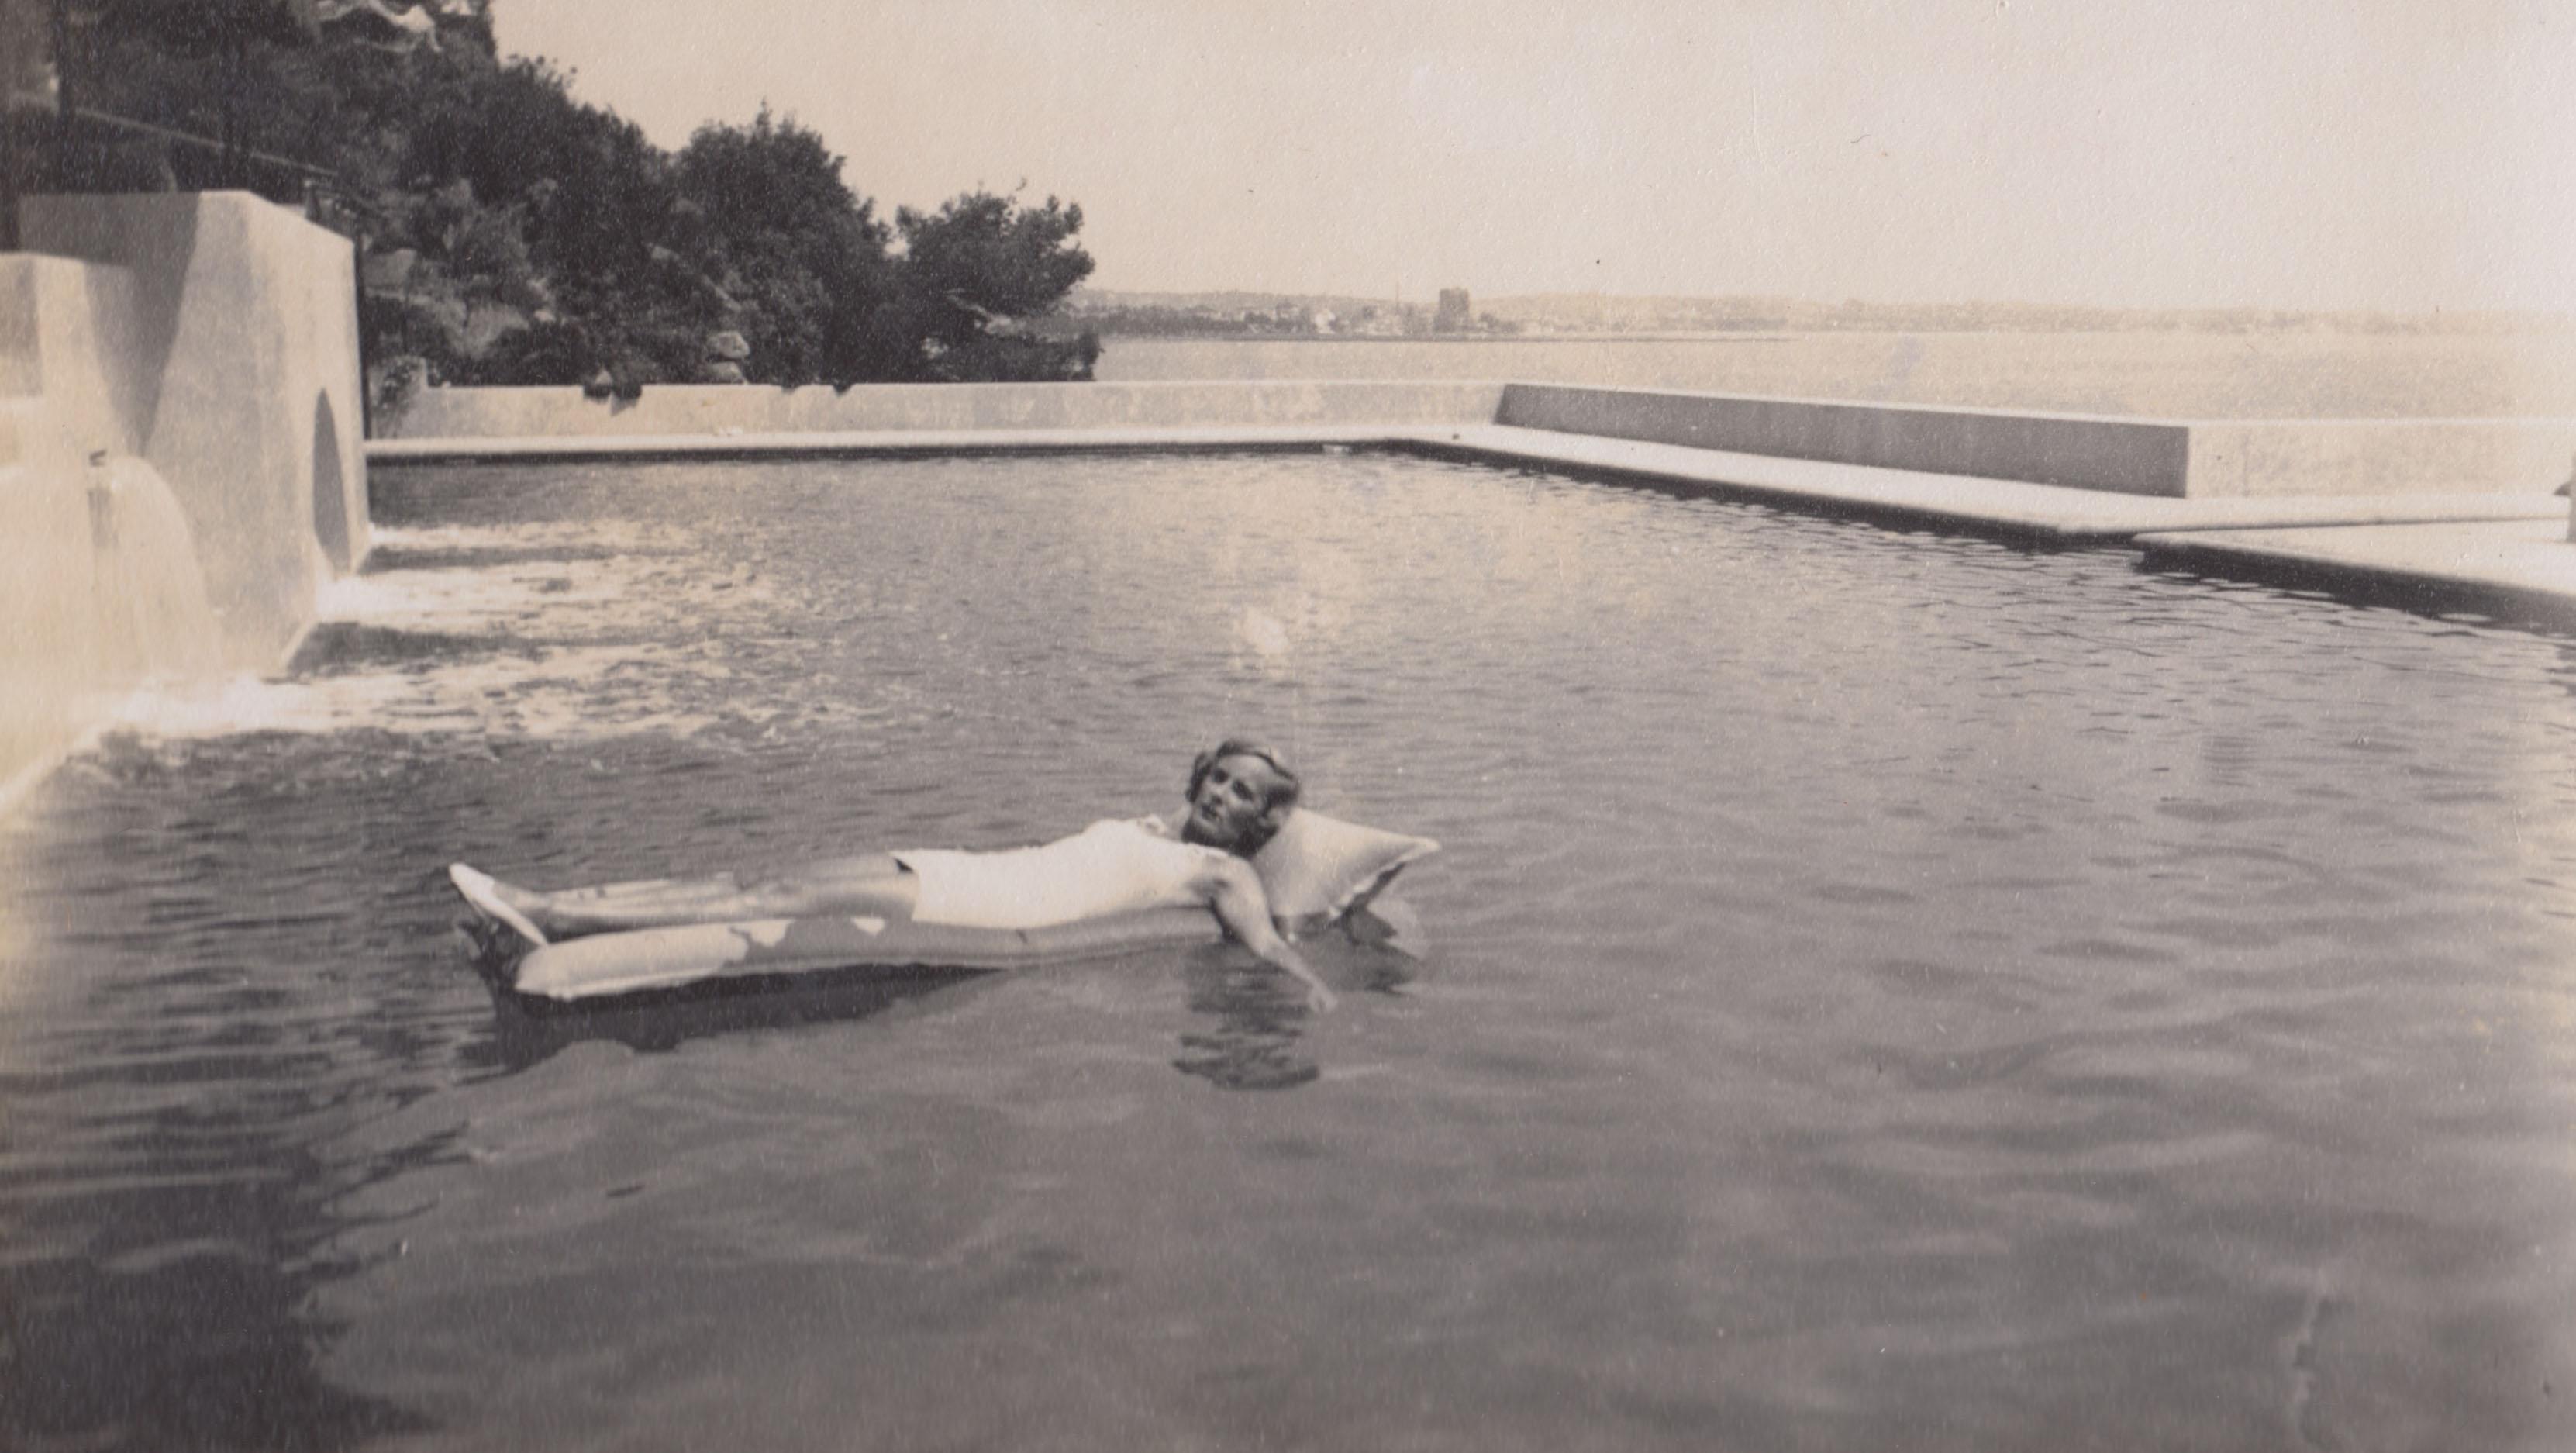 Doris Castlerosse taken at Chateau de L'Horizon, French Riviera mid 1930s